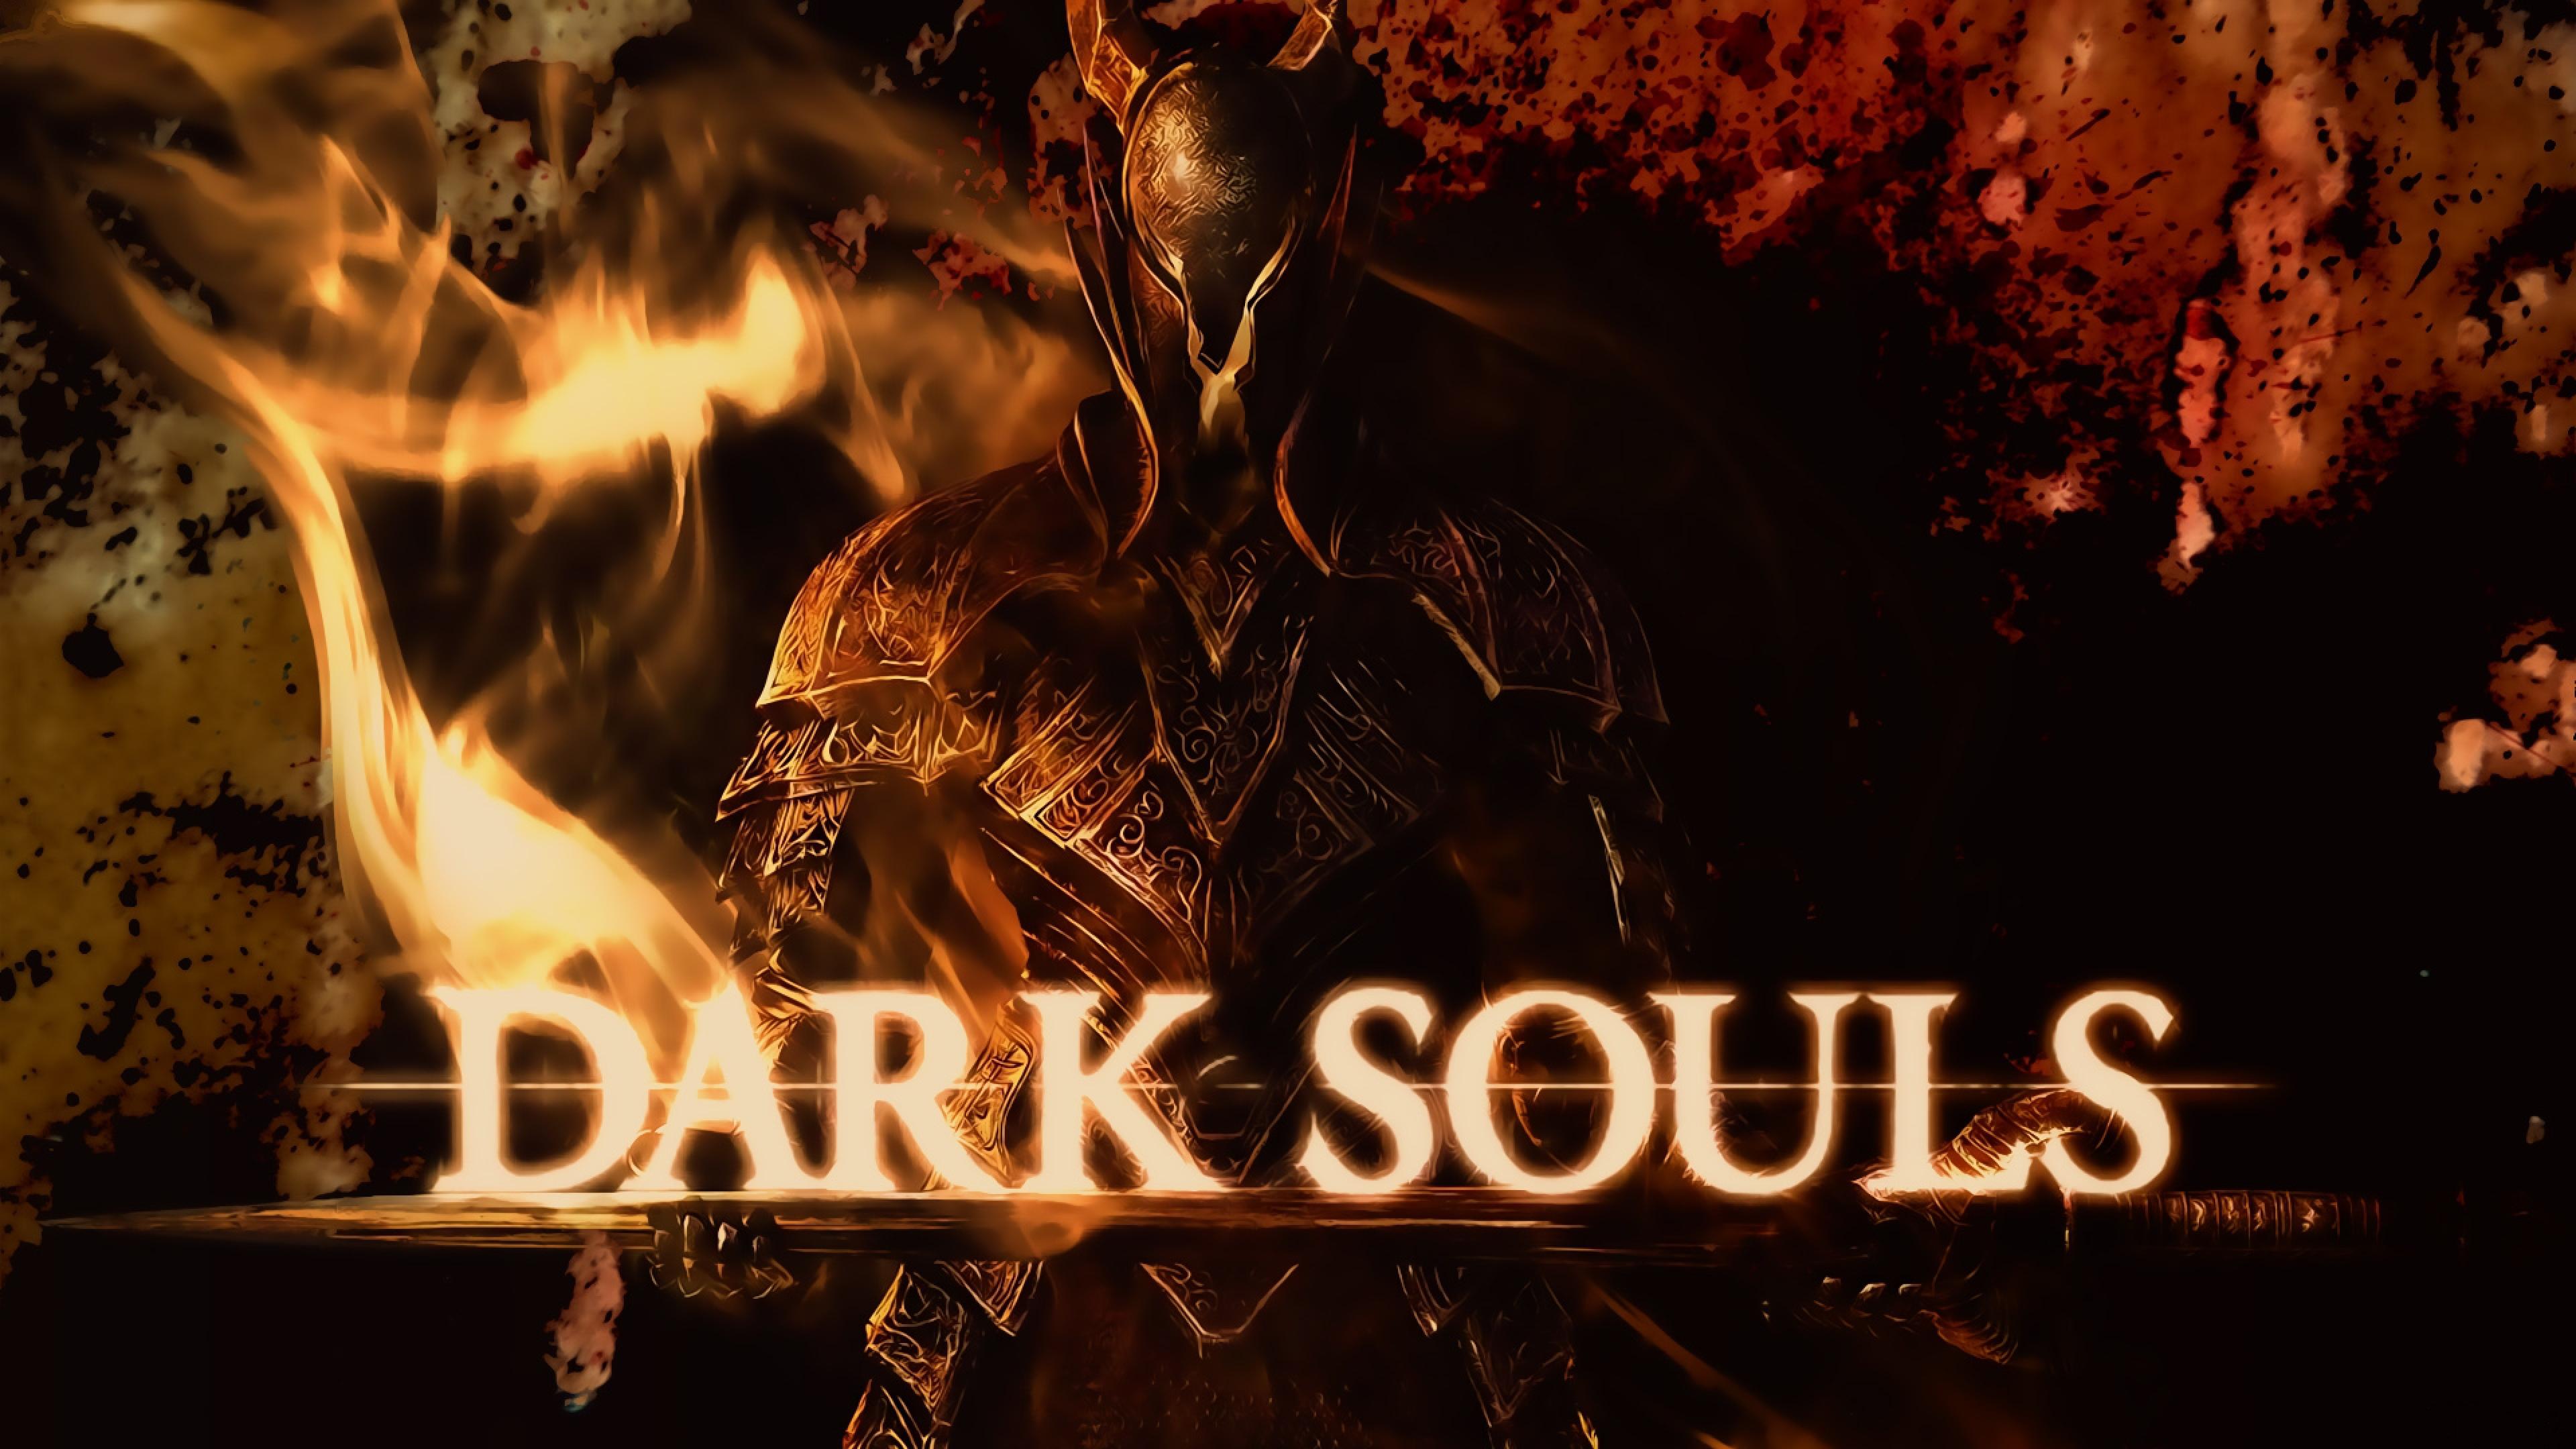 dark souls armor blood light name 3840x2160